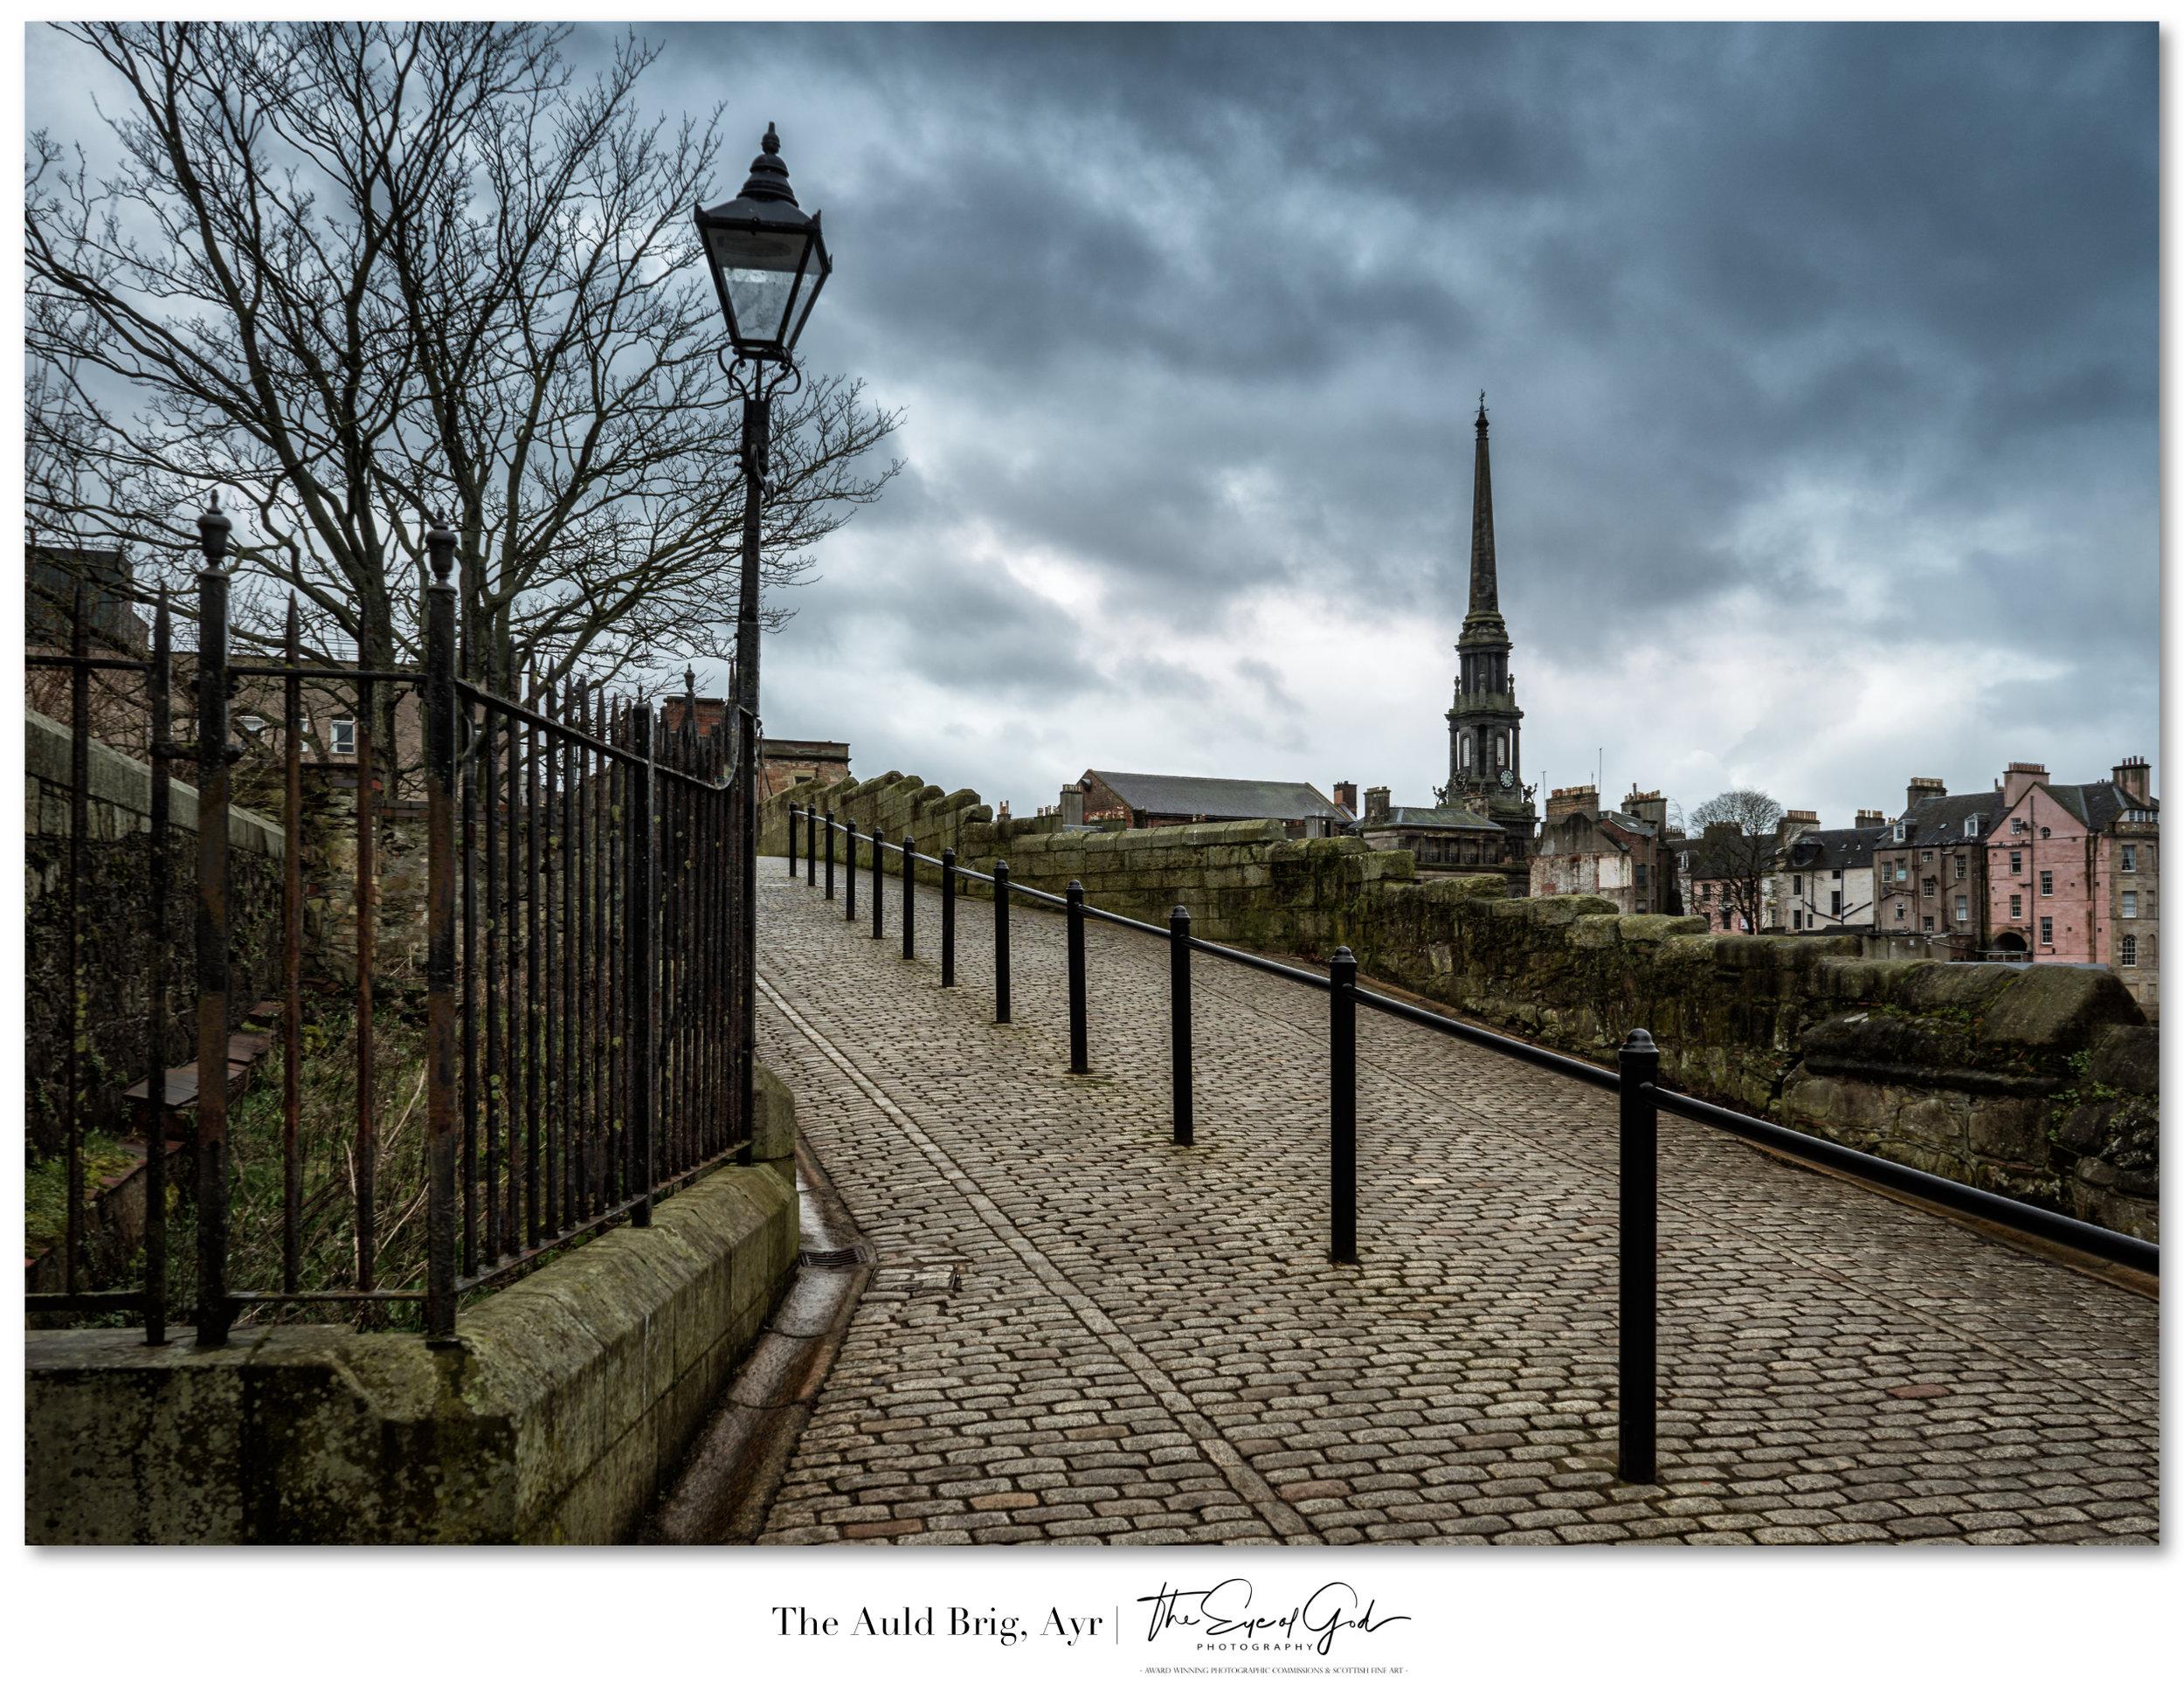 The_Auld_Brig_Ayr_Scott_Wanstall_Ayrshire_Photographer